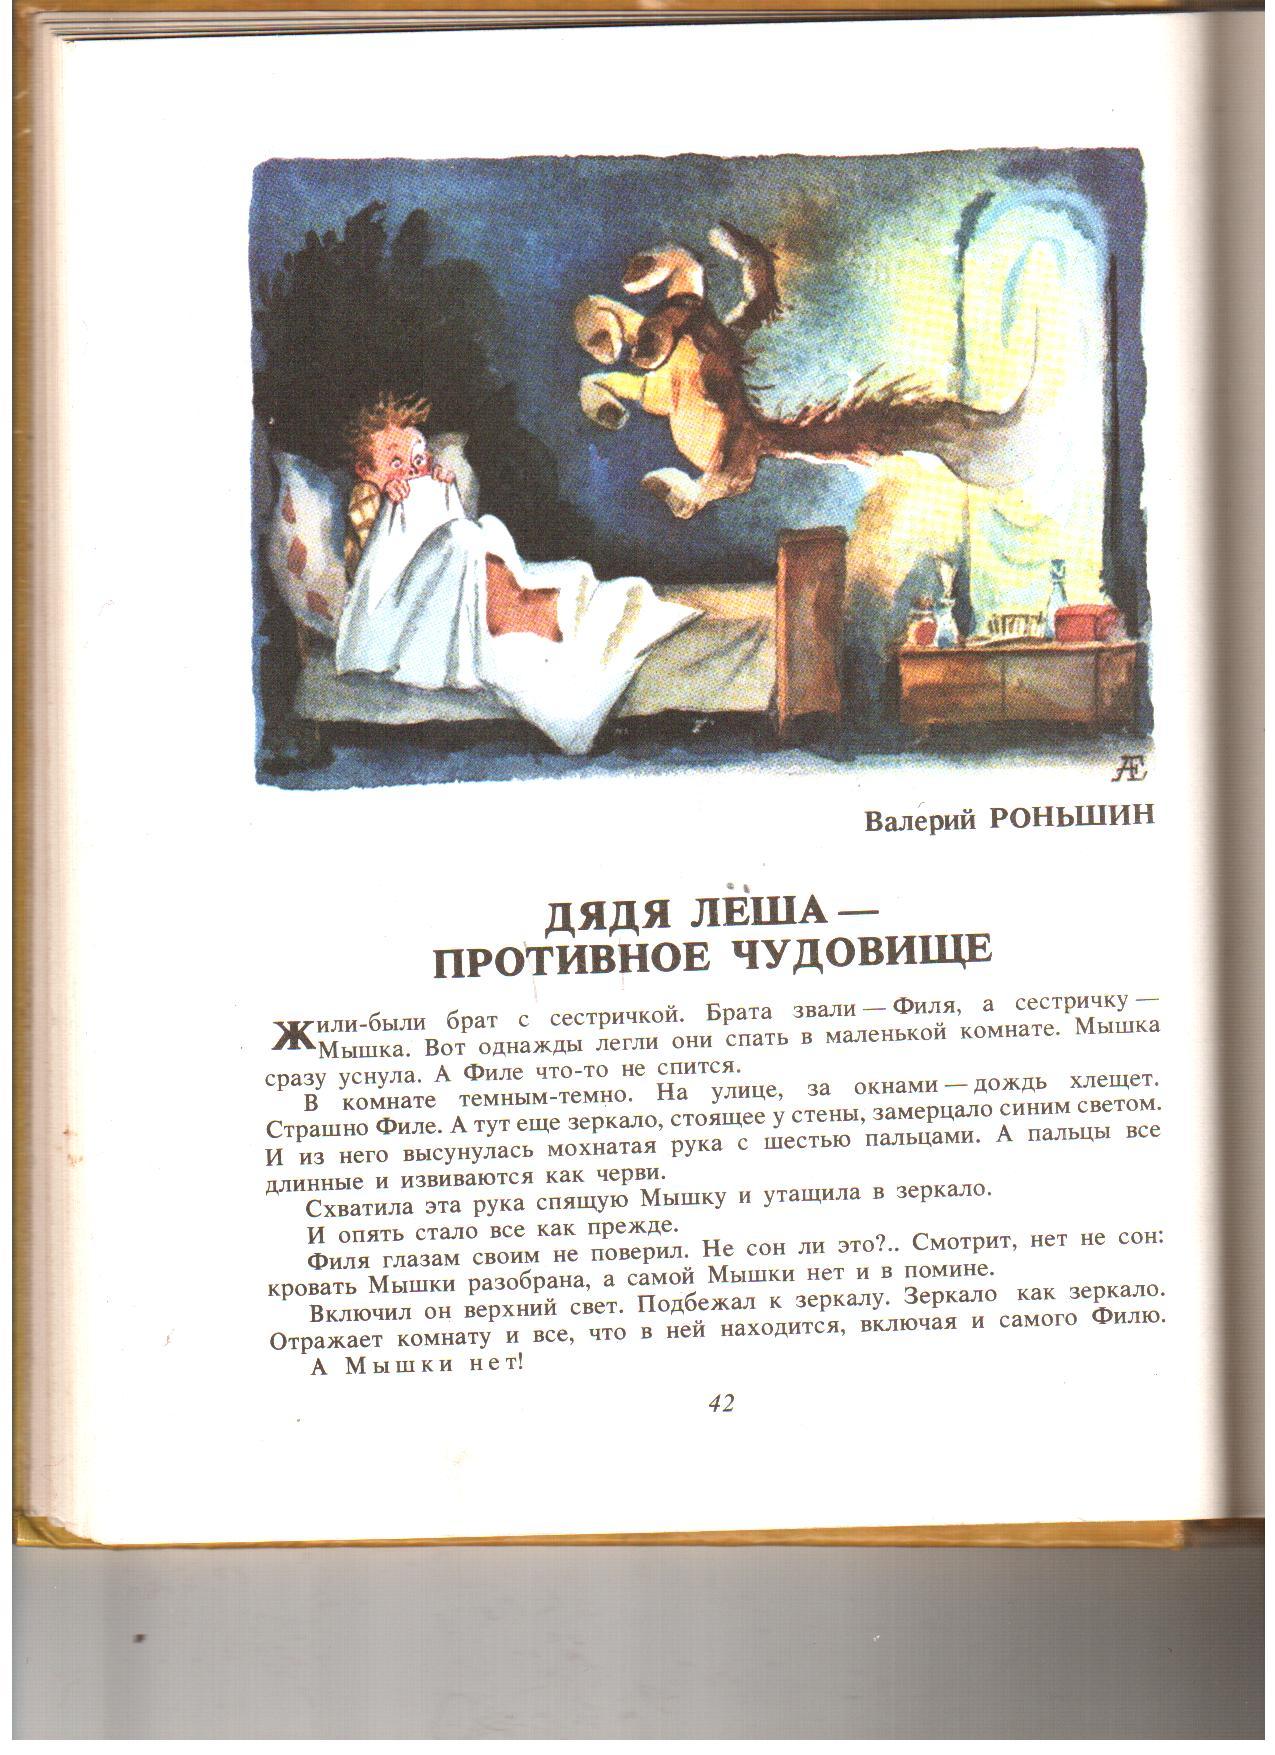 plemyannitsa-soset-chlen-rasskaz